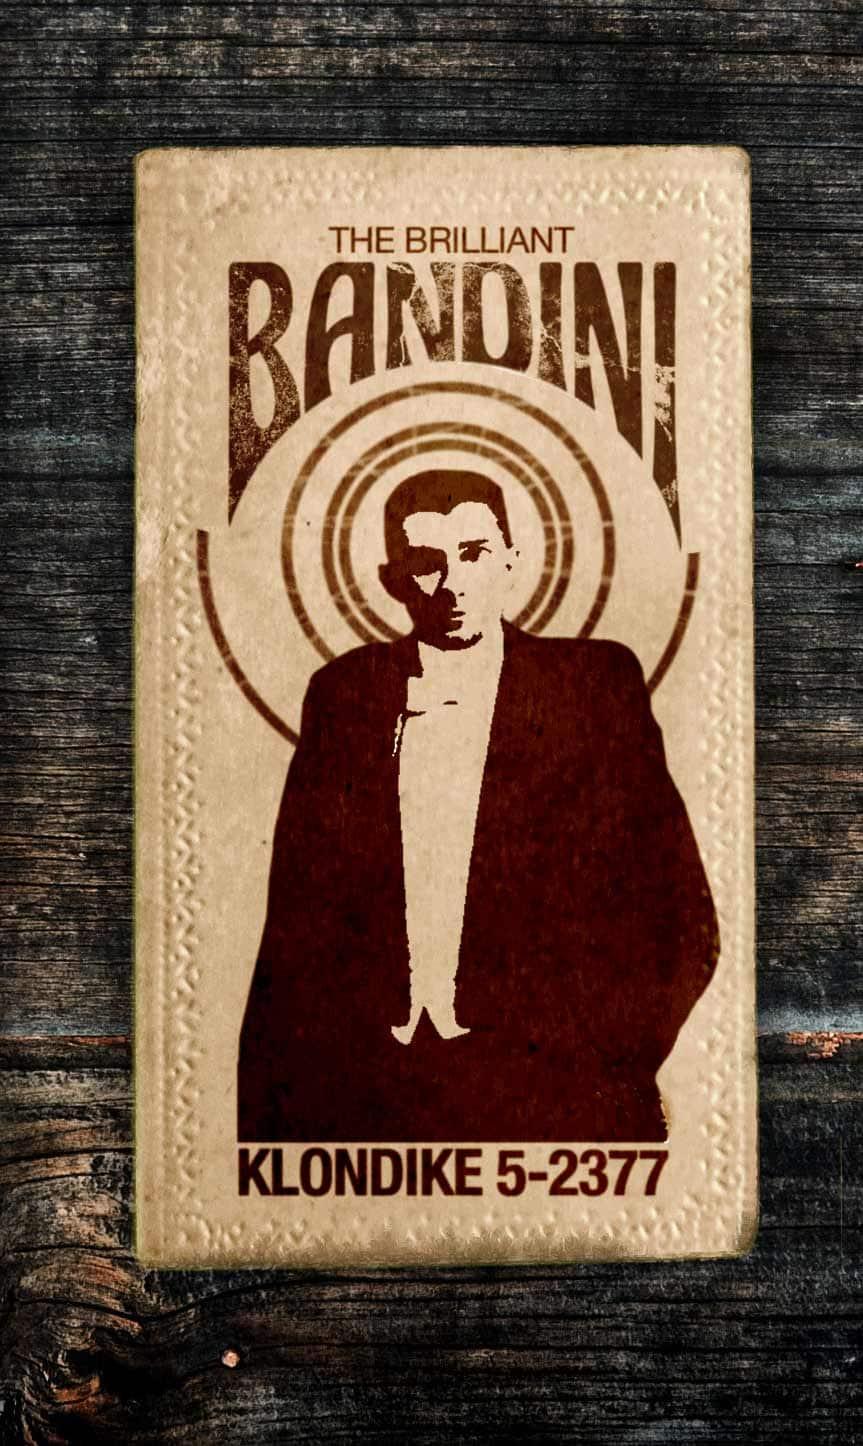 A calling card for The Brilliant Bandini, Mentalist Extraordinaire.